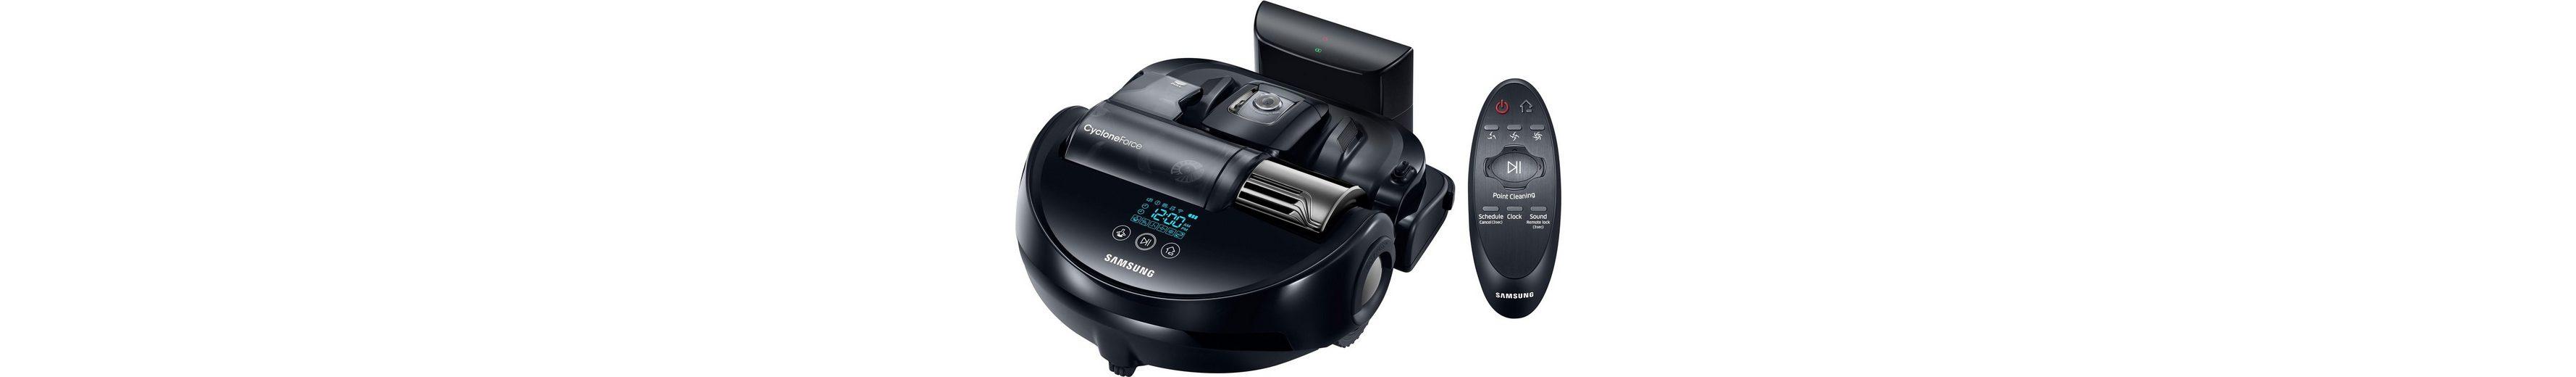 Samsung Saugroboter VR20J9259UC/EG, beutellos